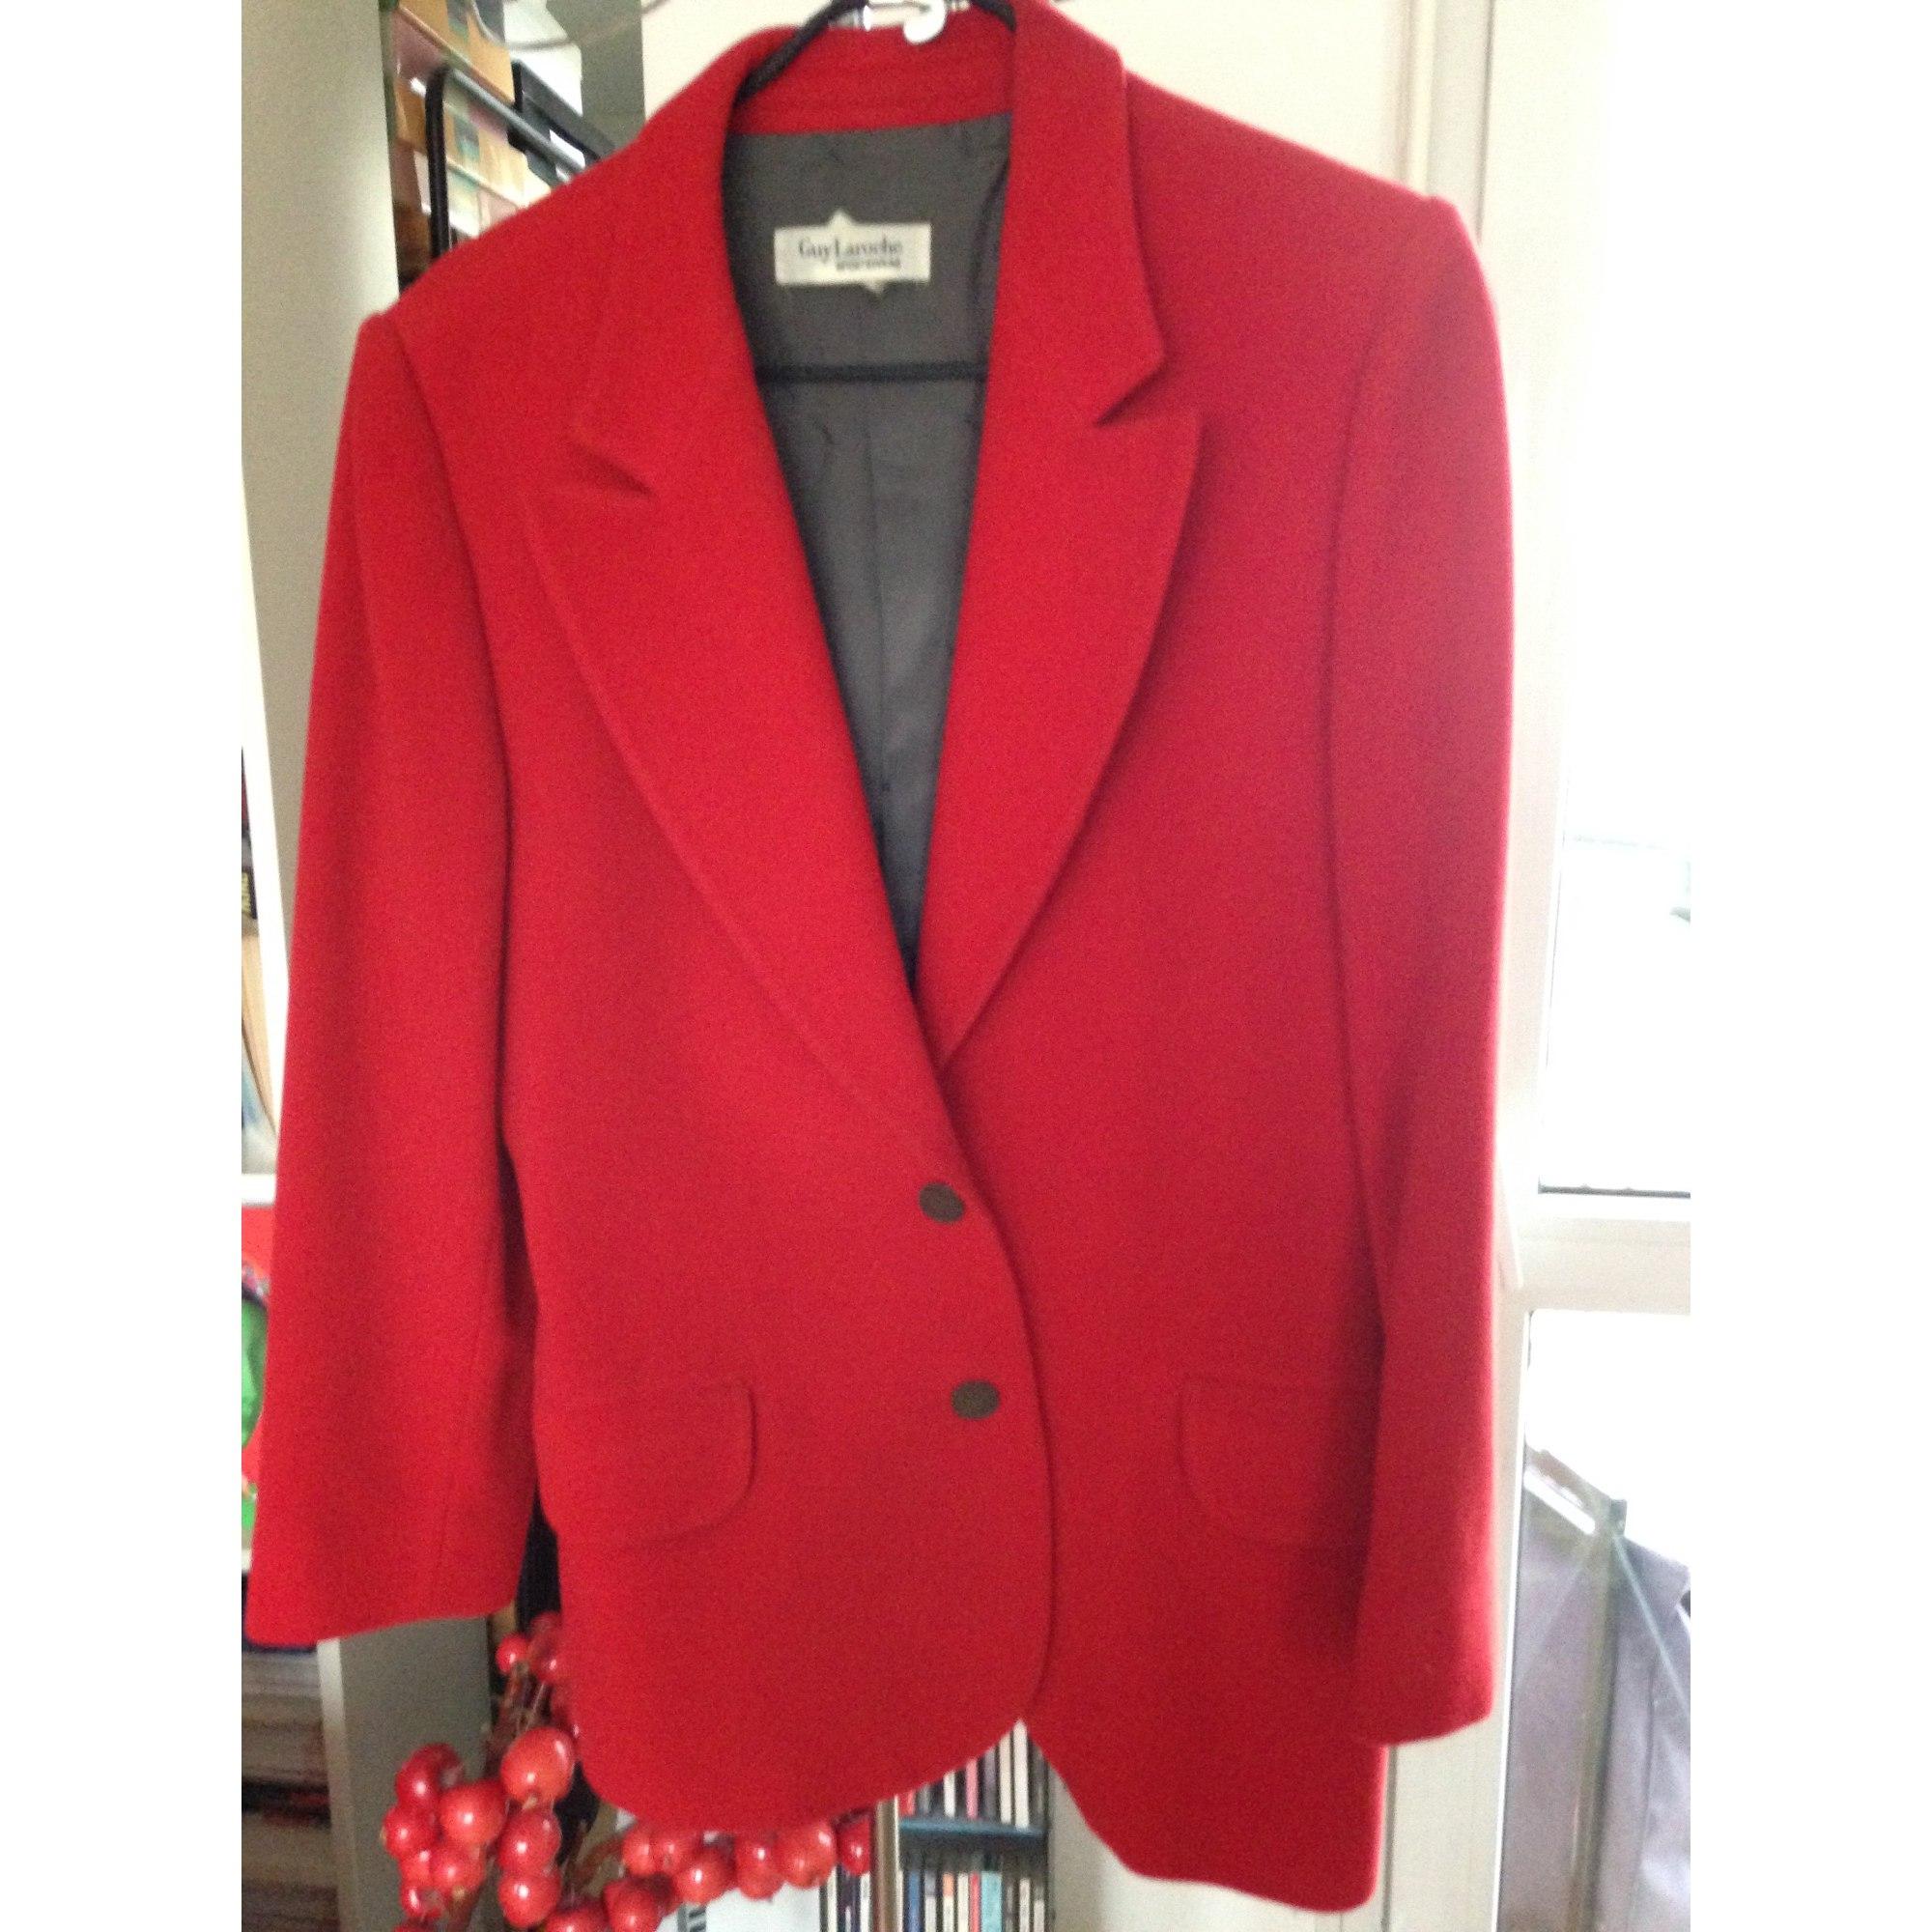 Blazer, veste tailleur GUY LAROCHE Rouge, bordeaux